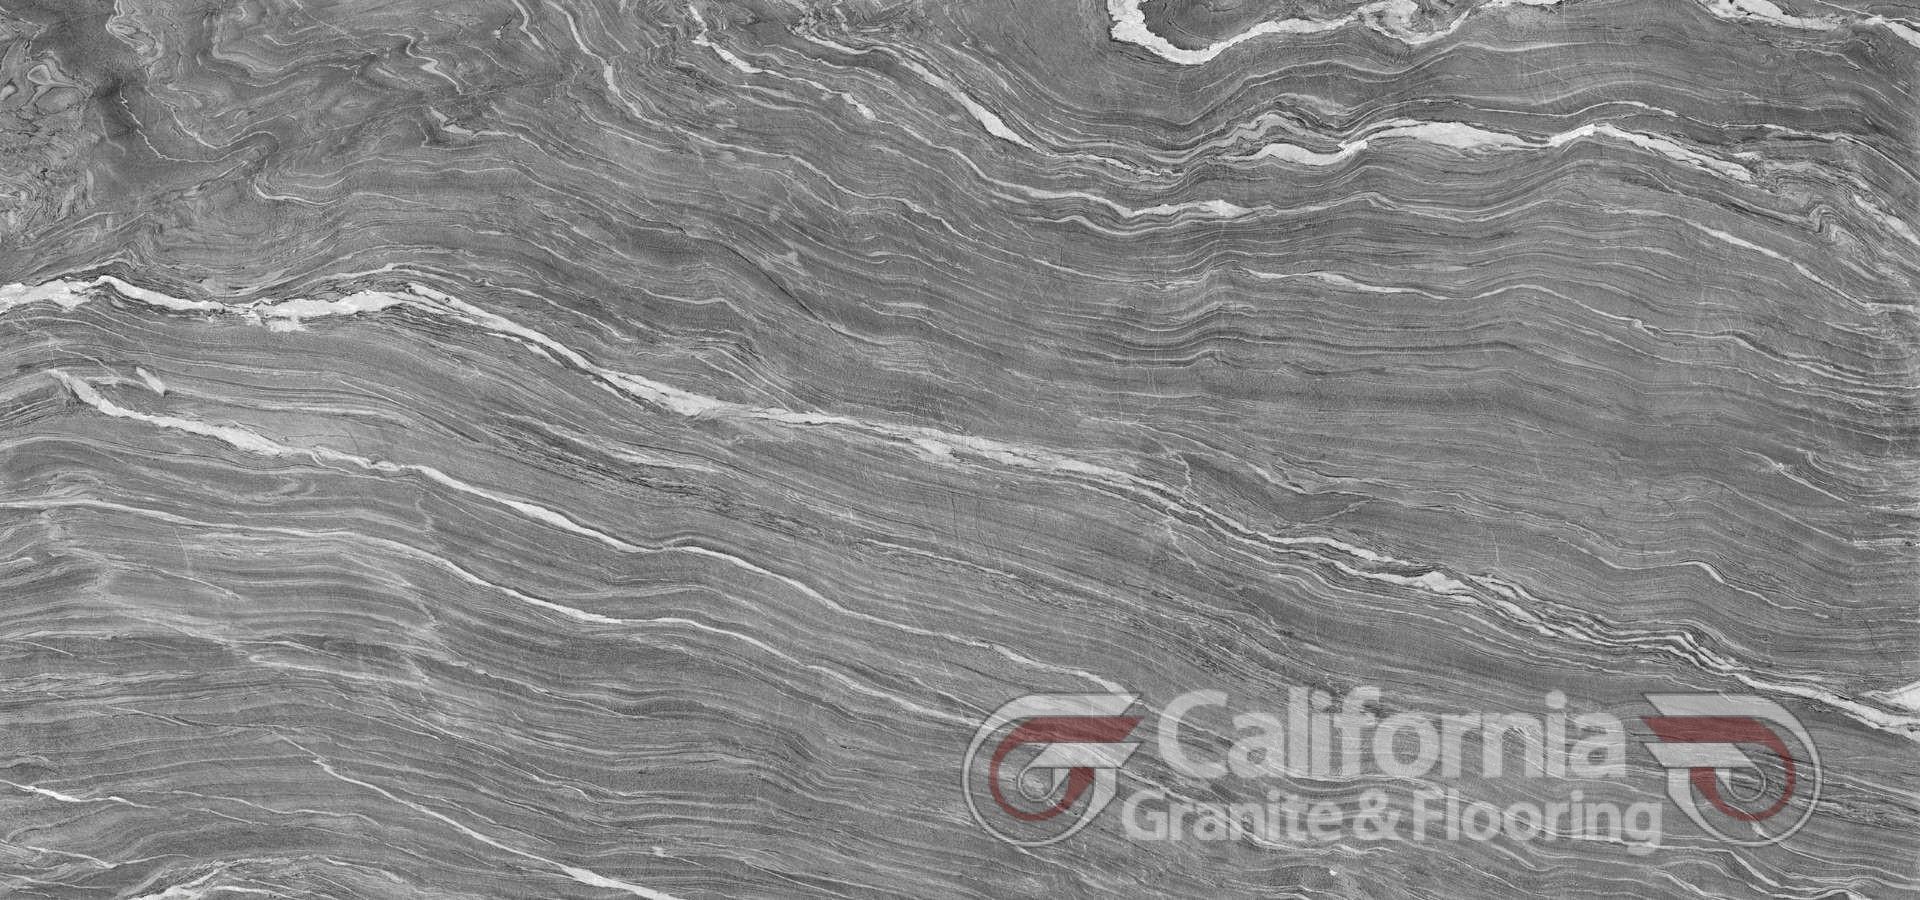 Mar Del Plata California Granite And Flooring